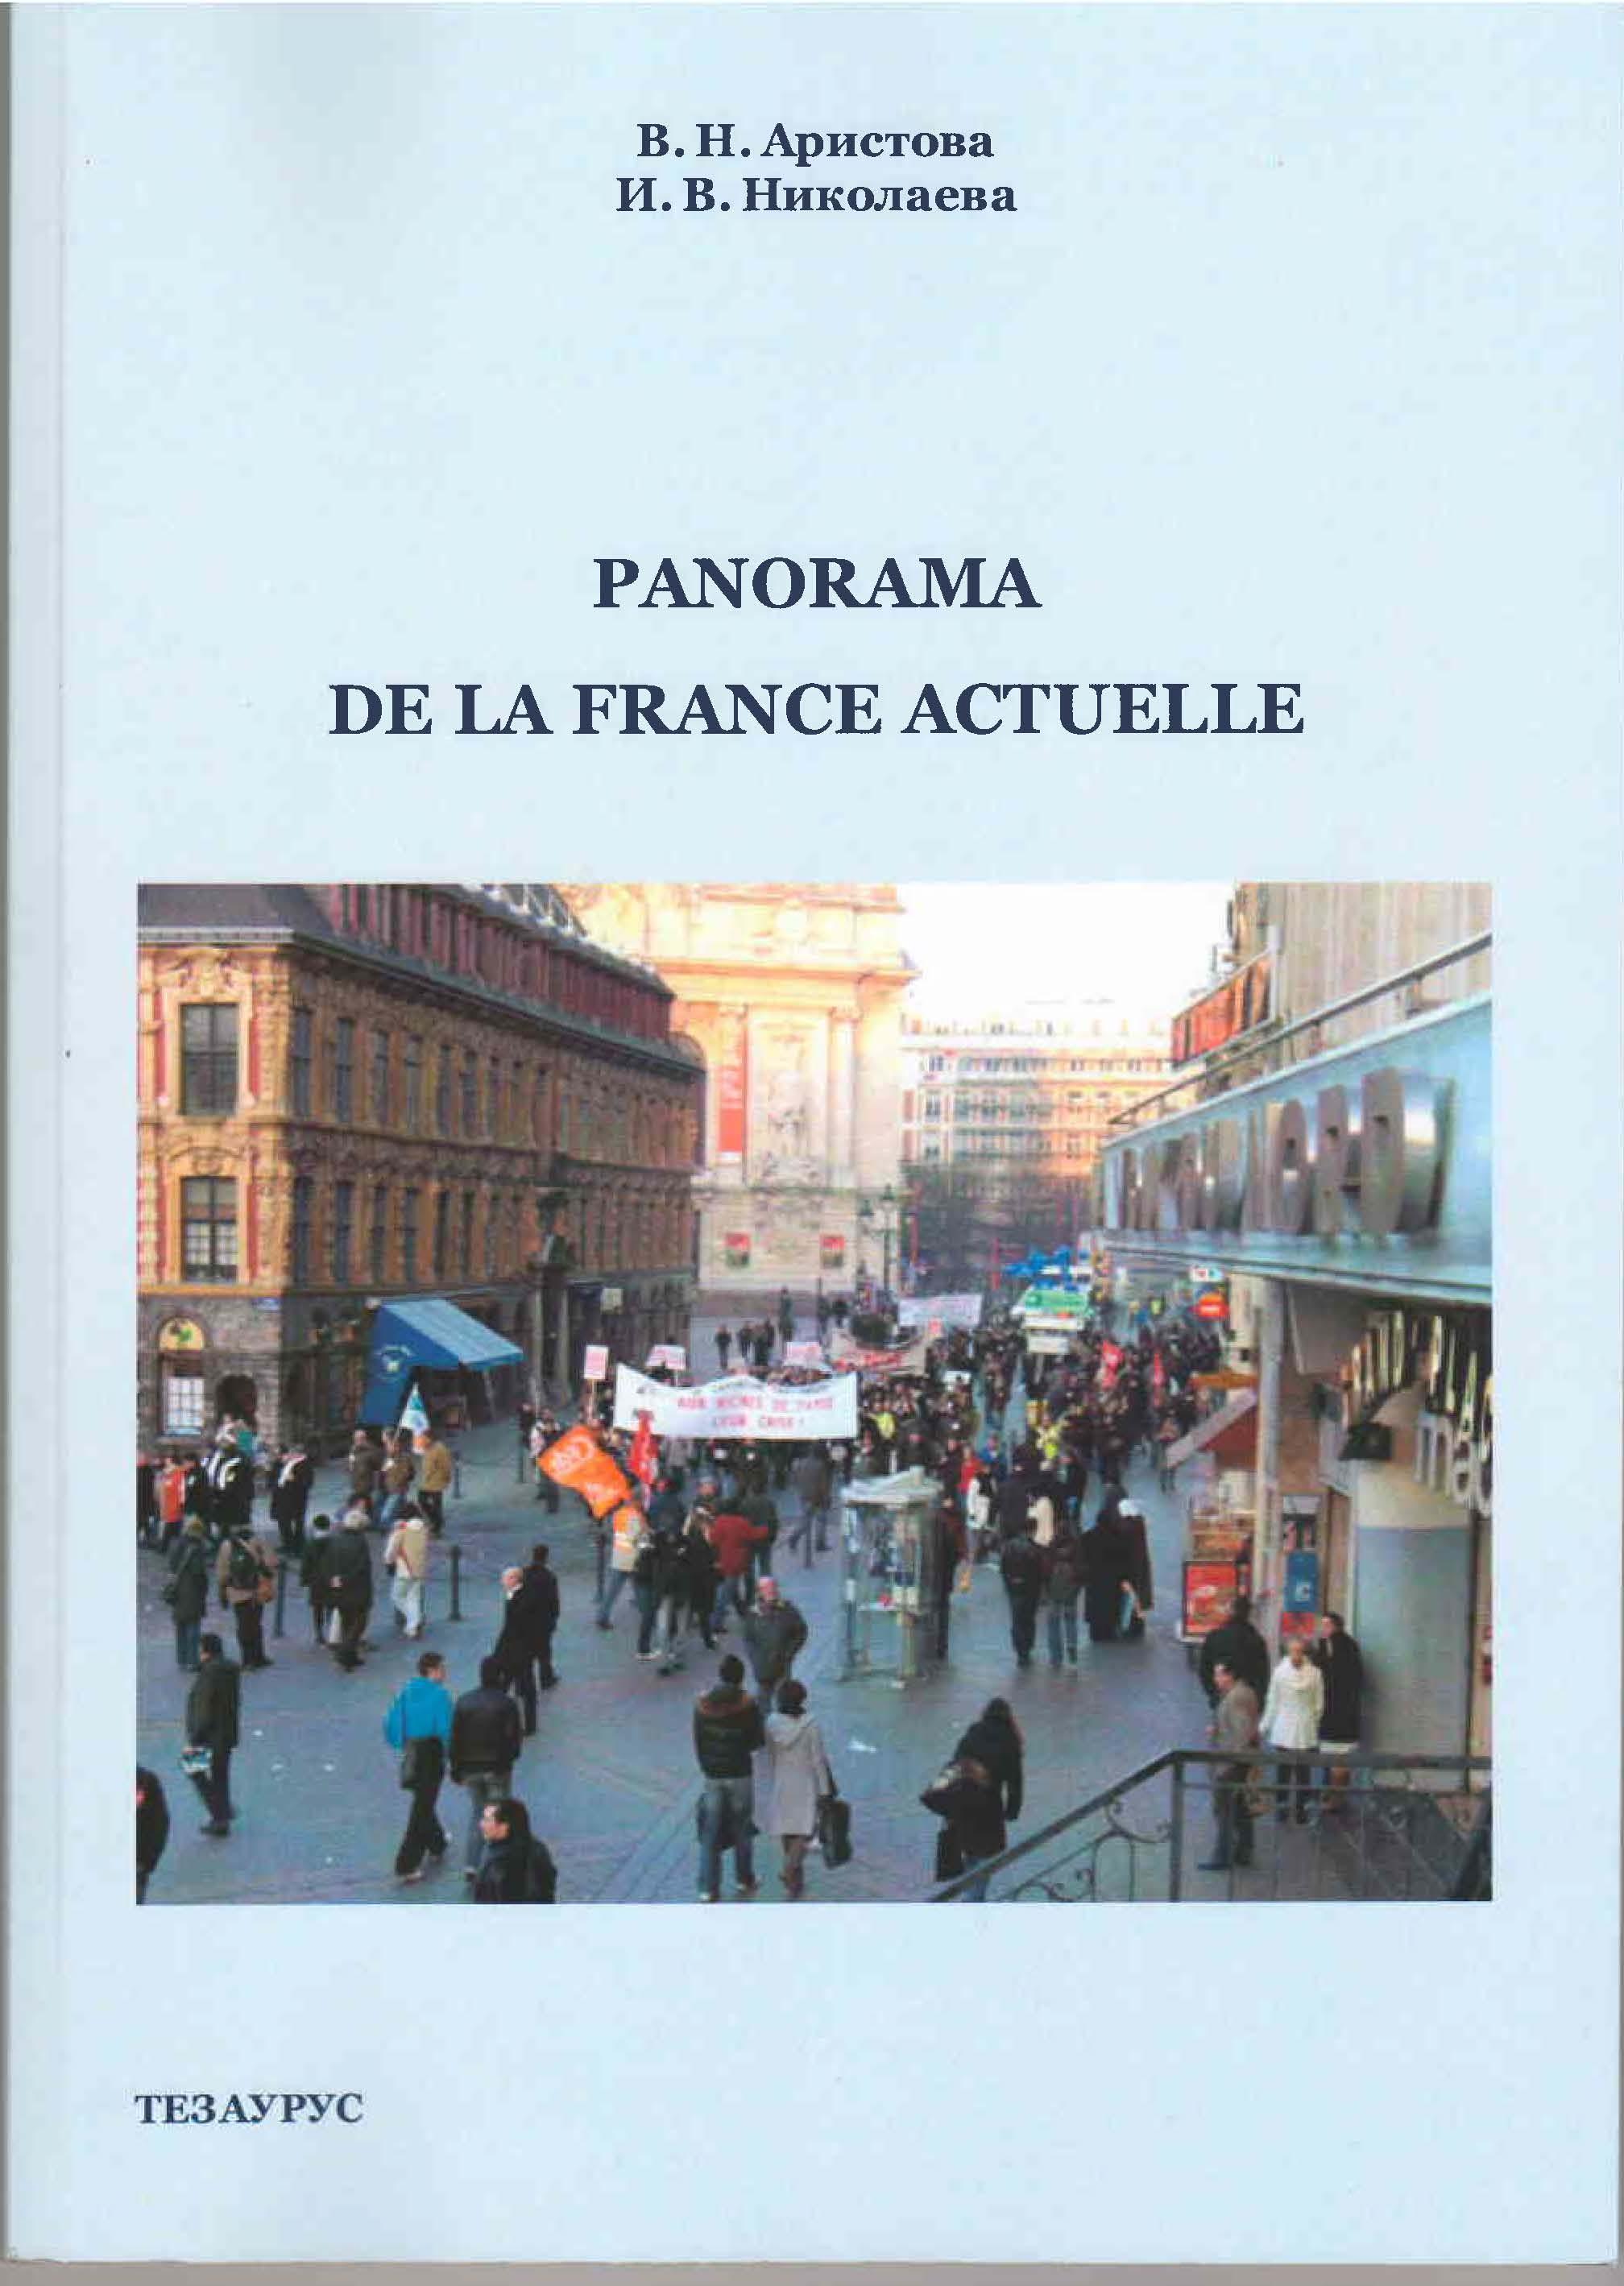 Panorama de la France actuelle: учебное пособие по лингвострановедению